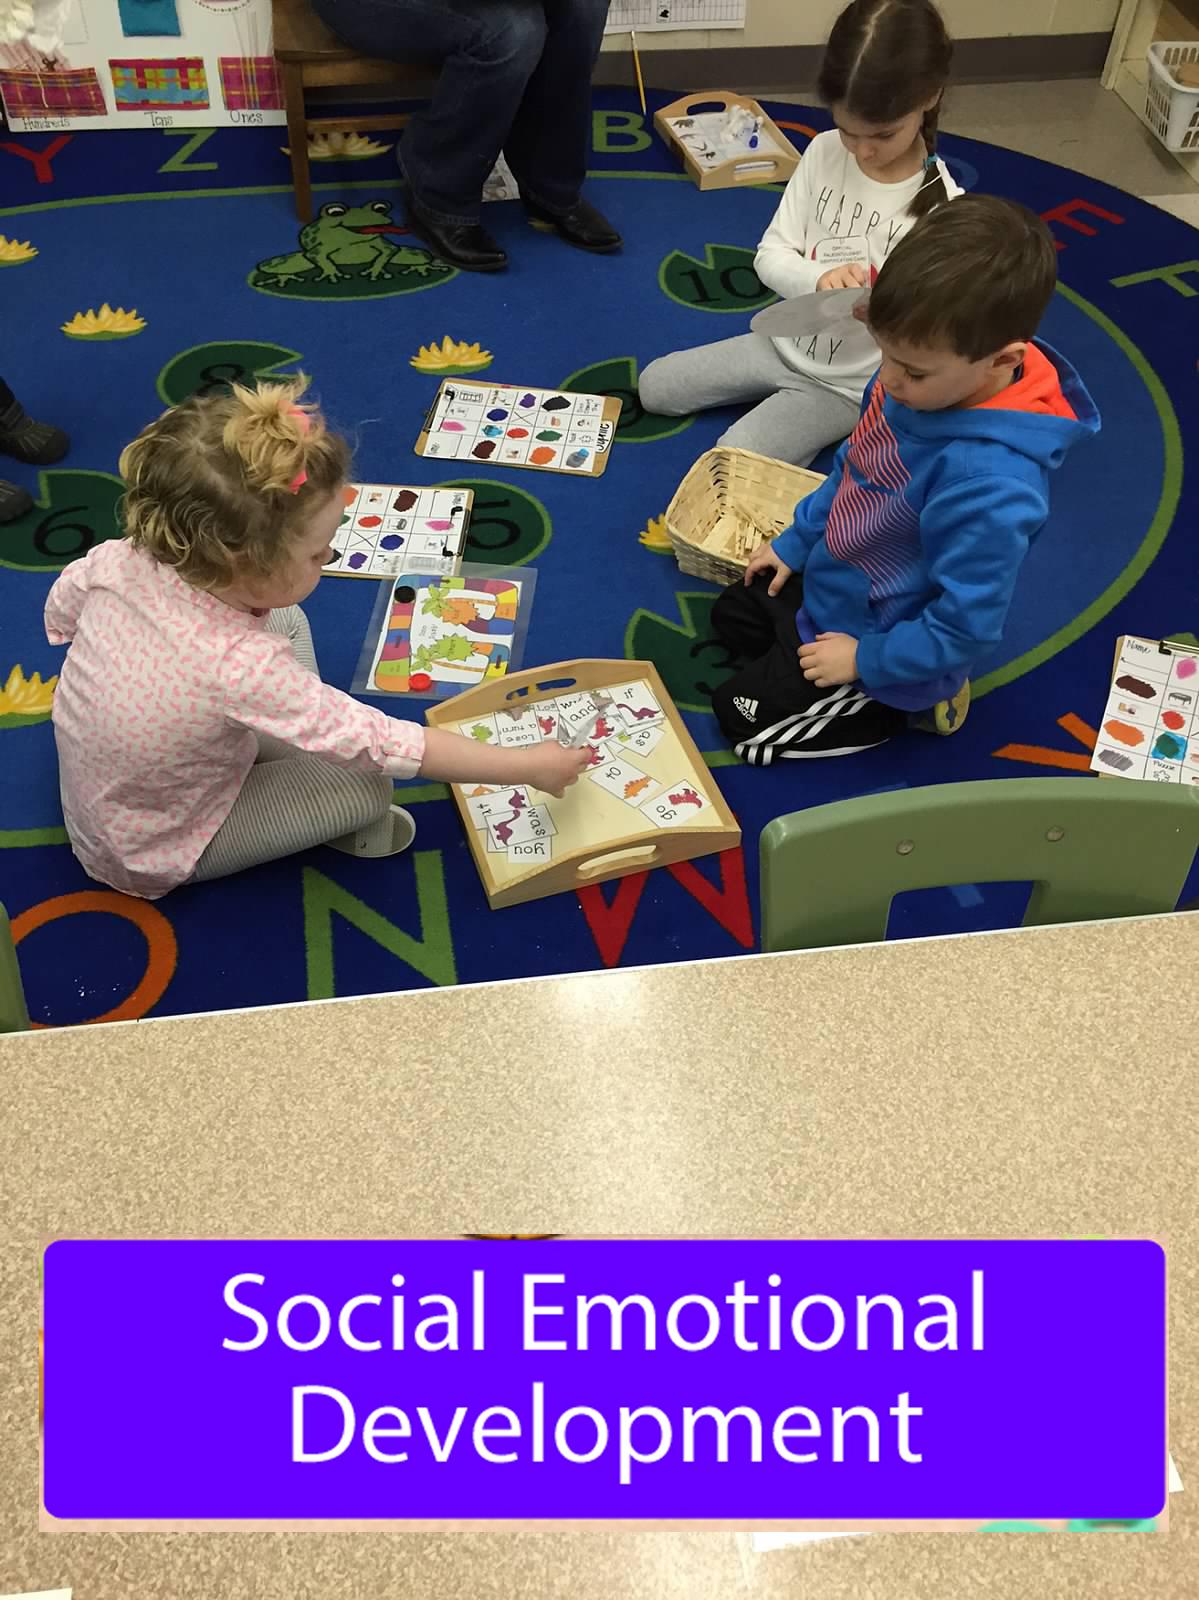 socialemotionalps2.jpg